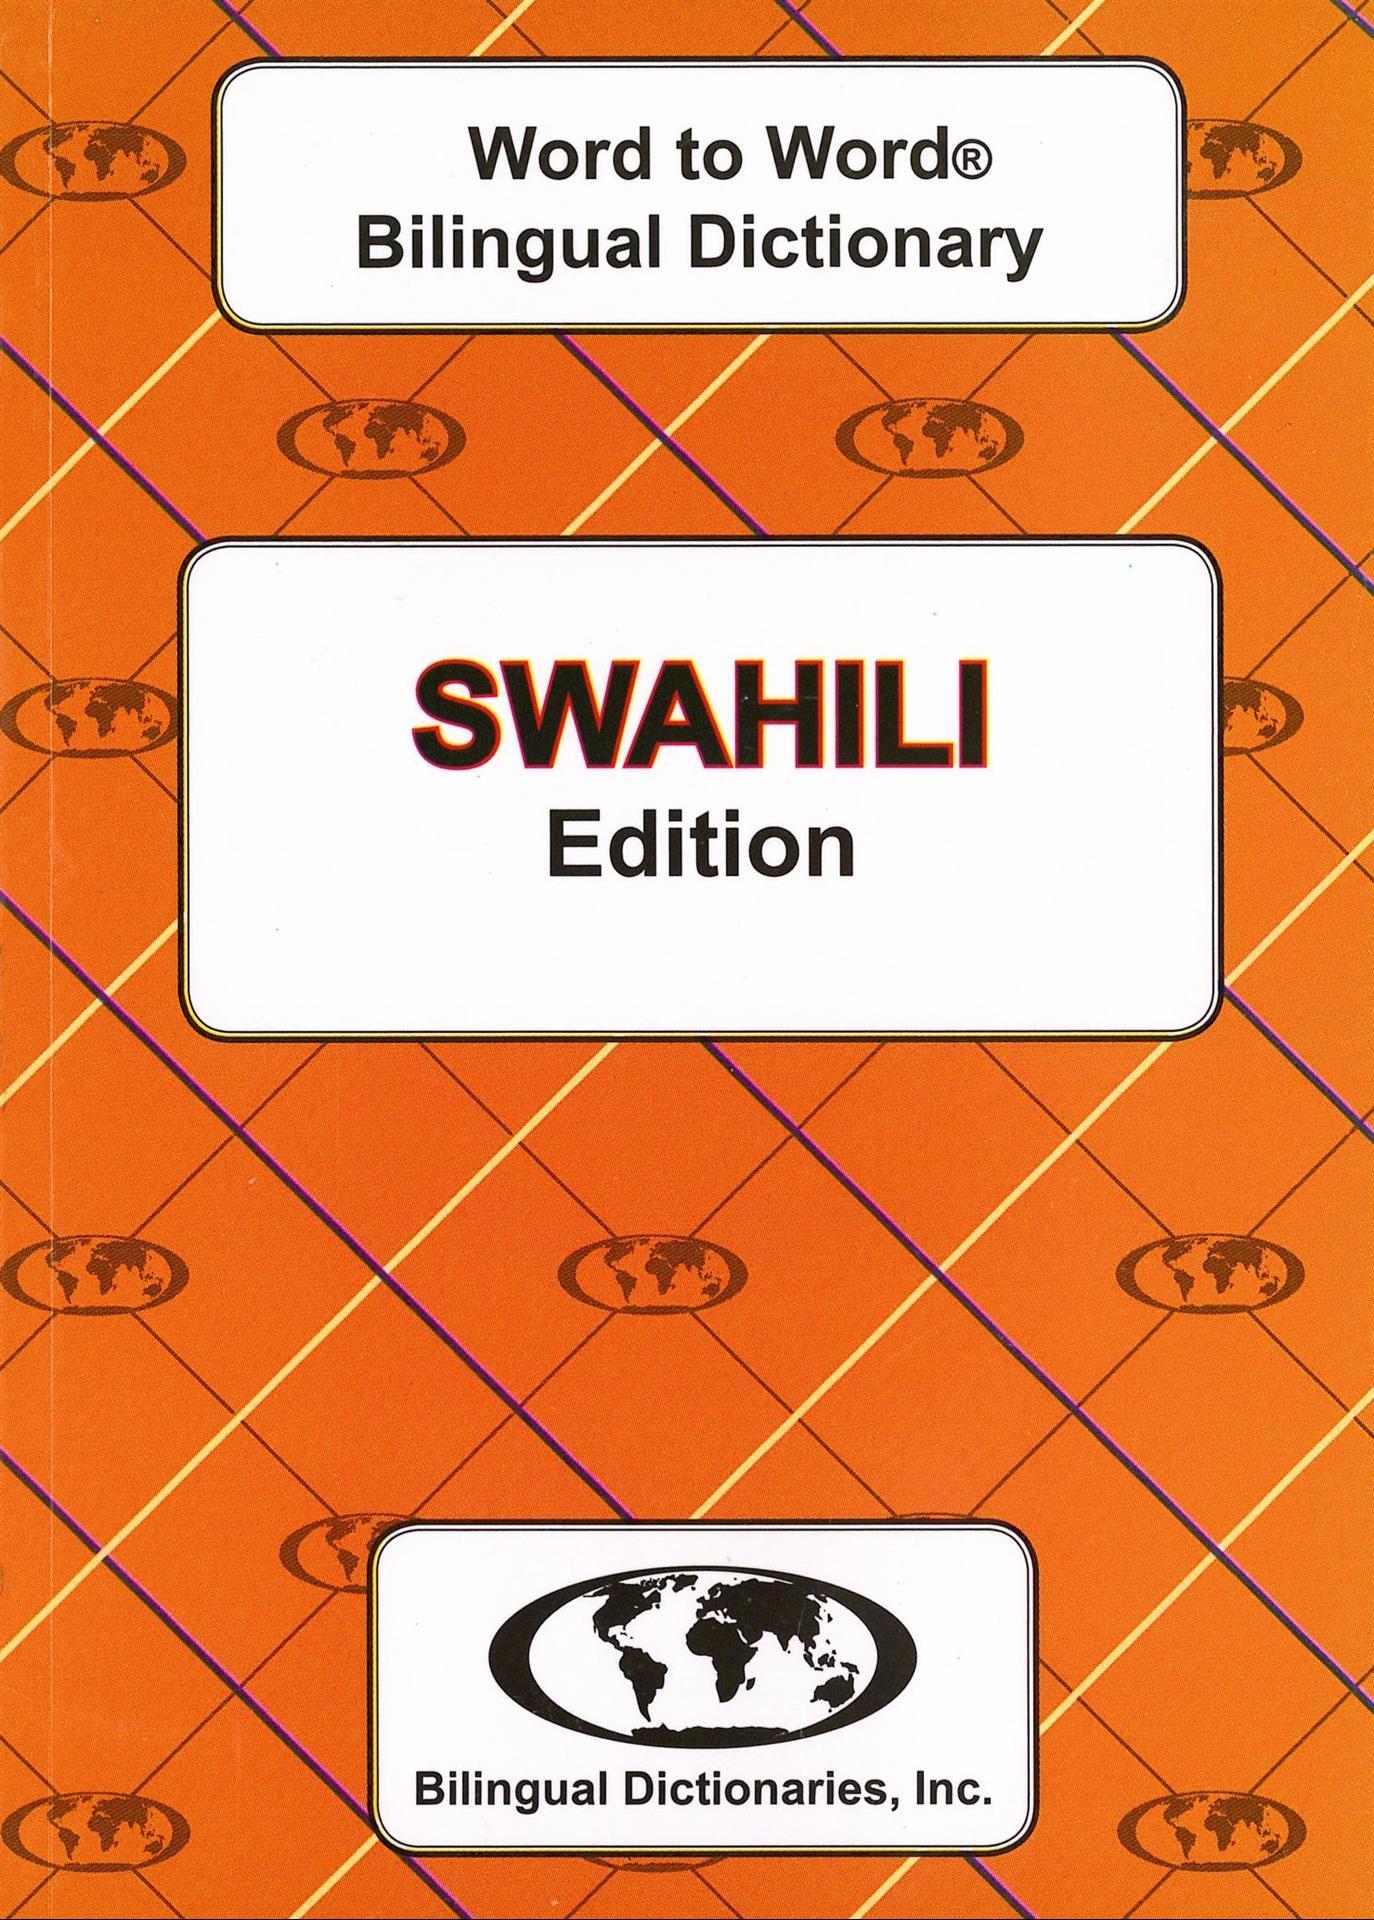 SWAHILI Word to Word Bilingual Dictionary